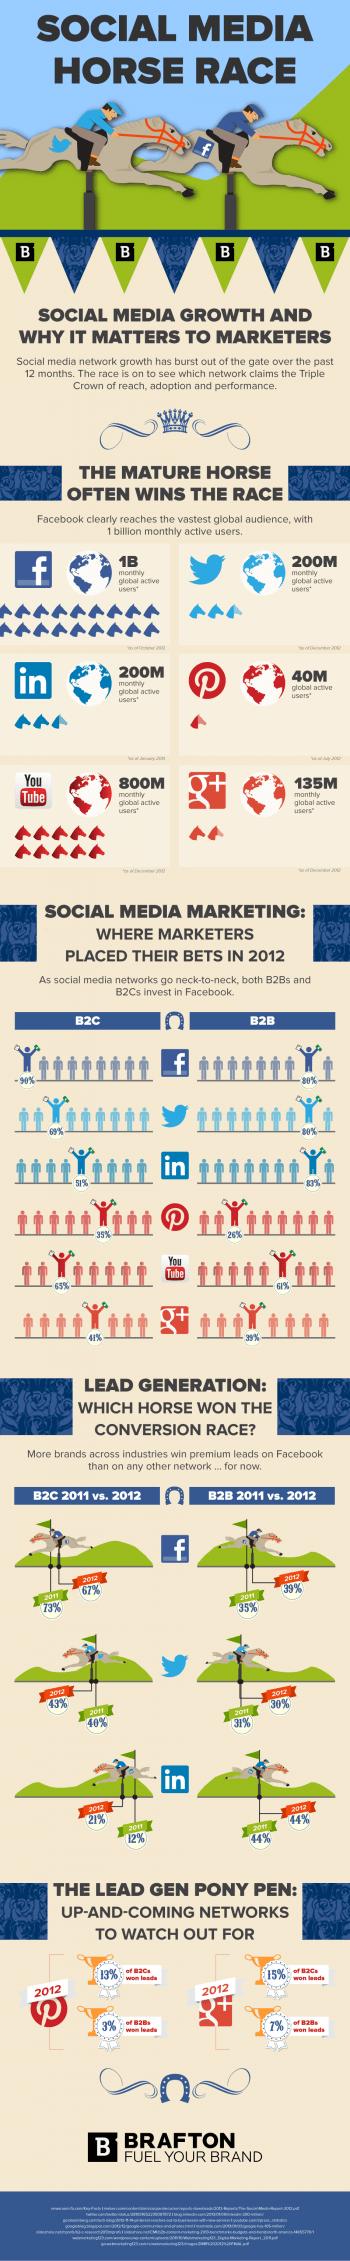 Brafton's Infographic: Social Media Horse Race